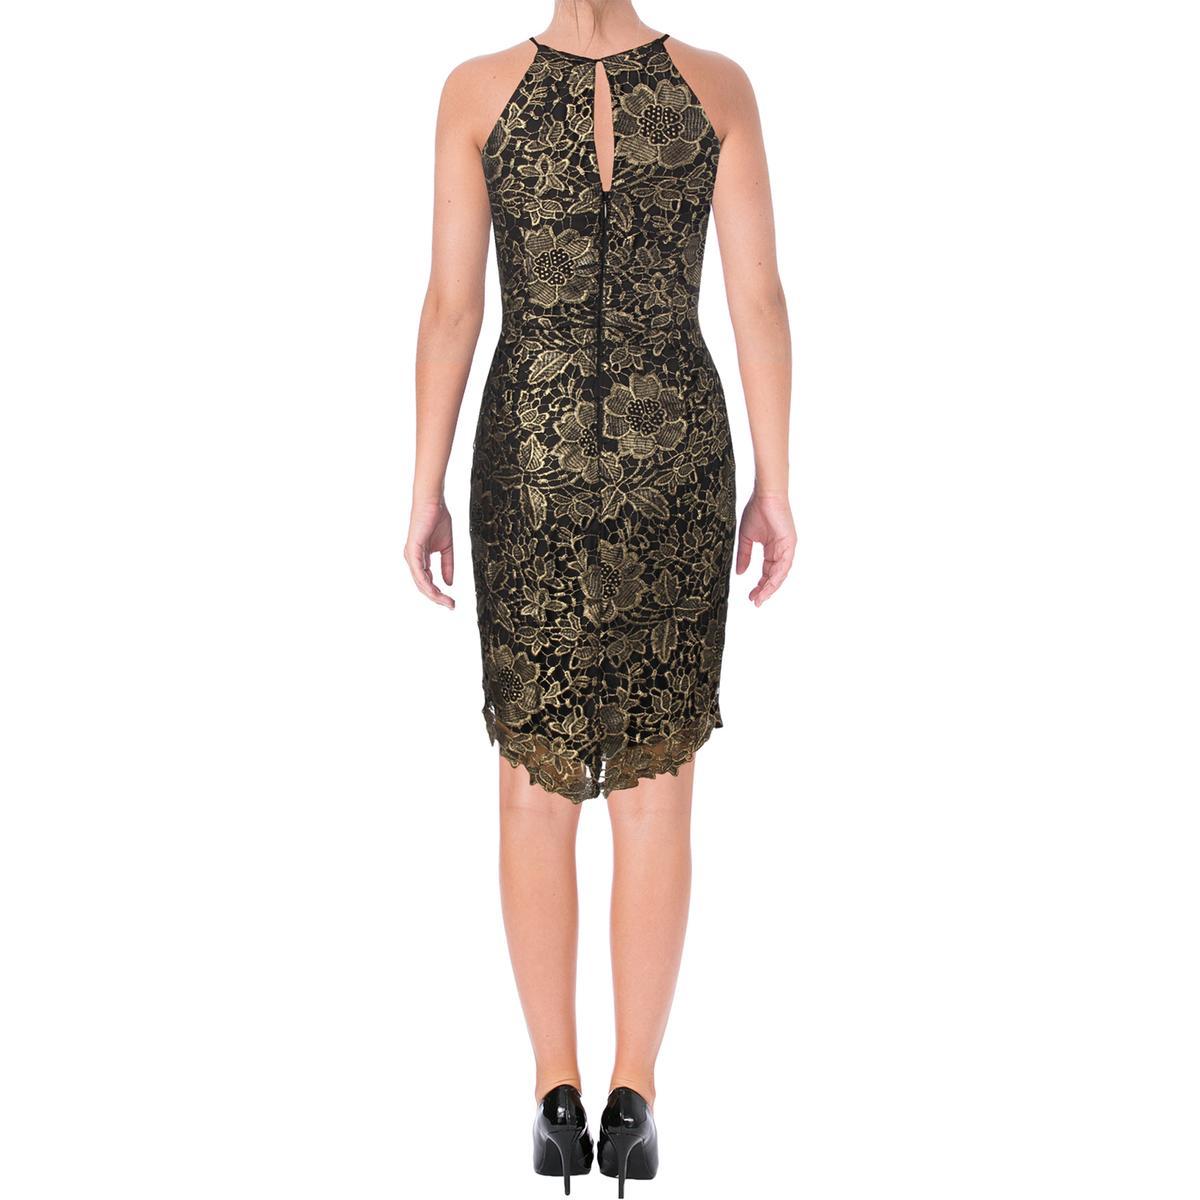 Lace Rae Womens Adelyn Metallic Clubwear Midi 5490 Dress Bhfo P7tqw